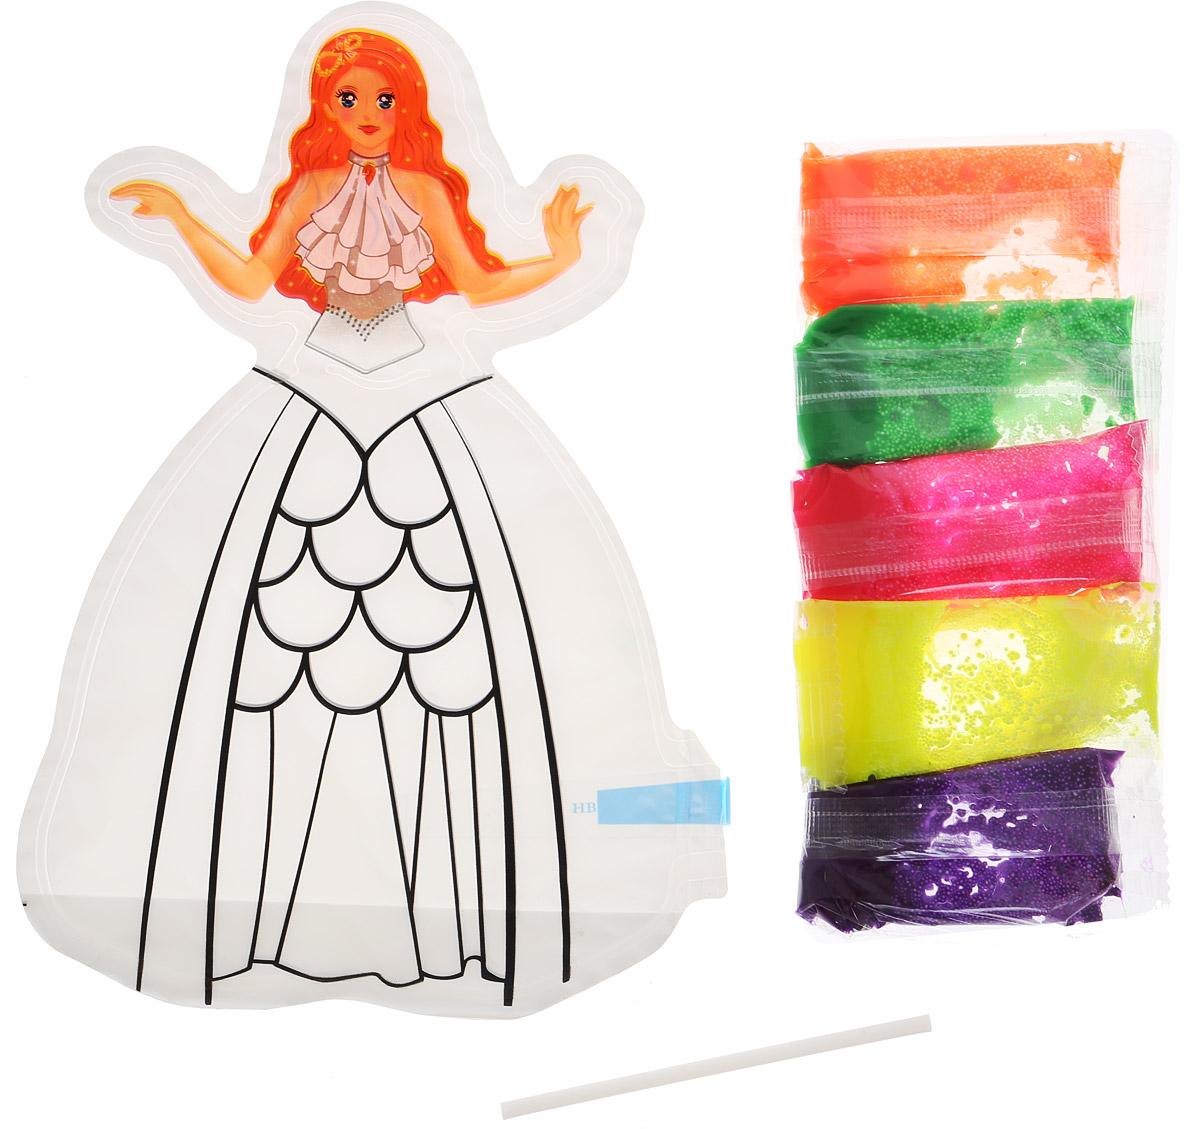 BradexРаскраска надувная Принцесса Лиза Bradex